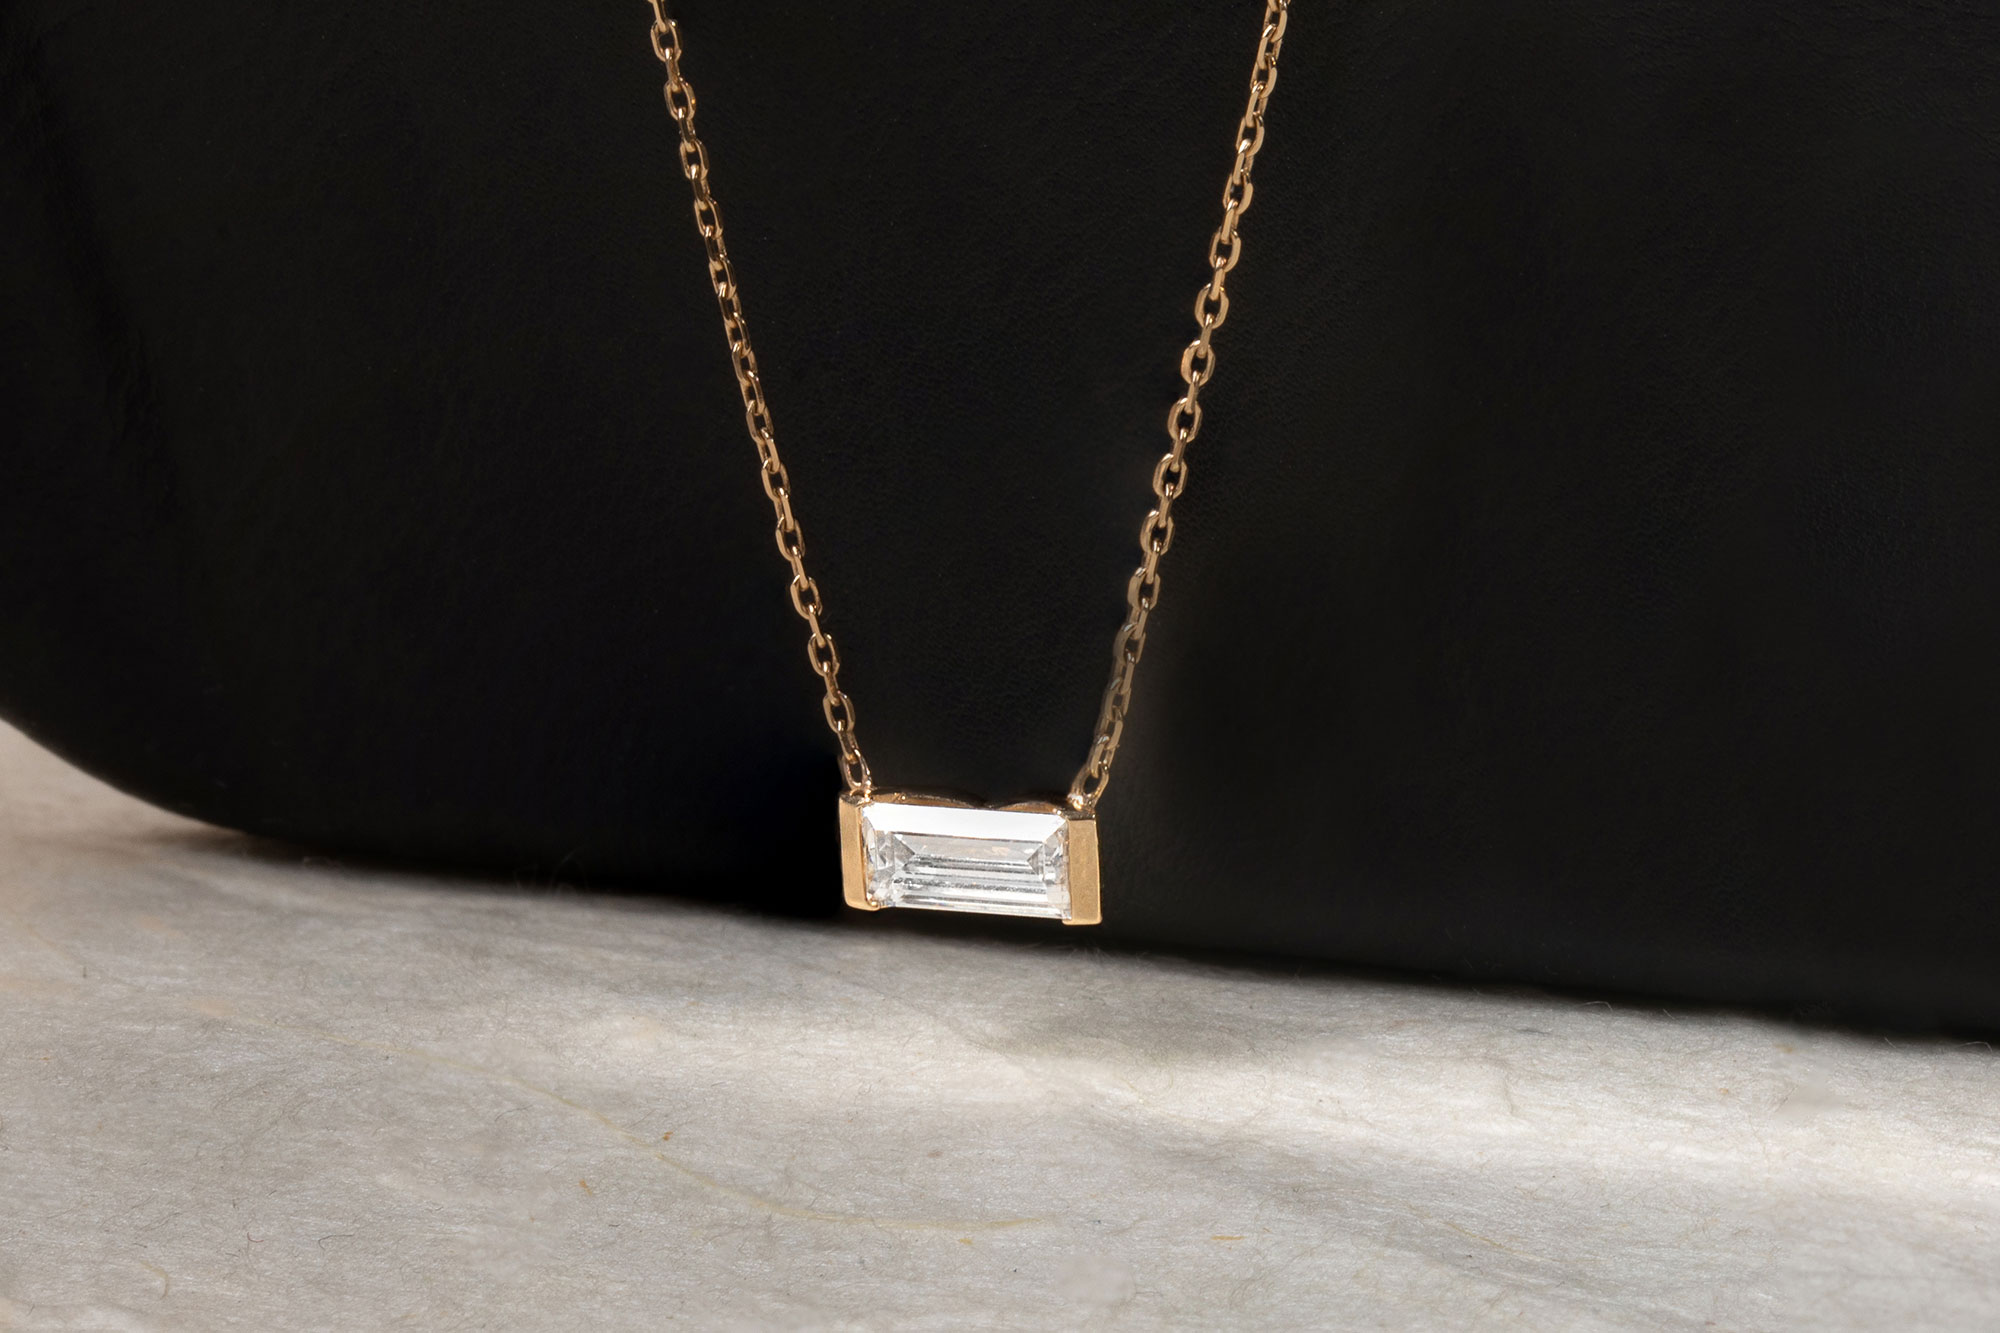 Yellow gold baguette semi-bezel necklace